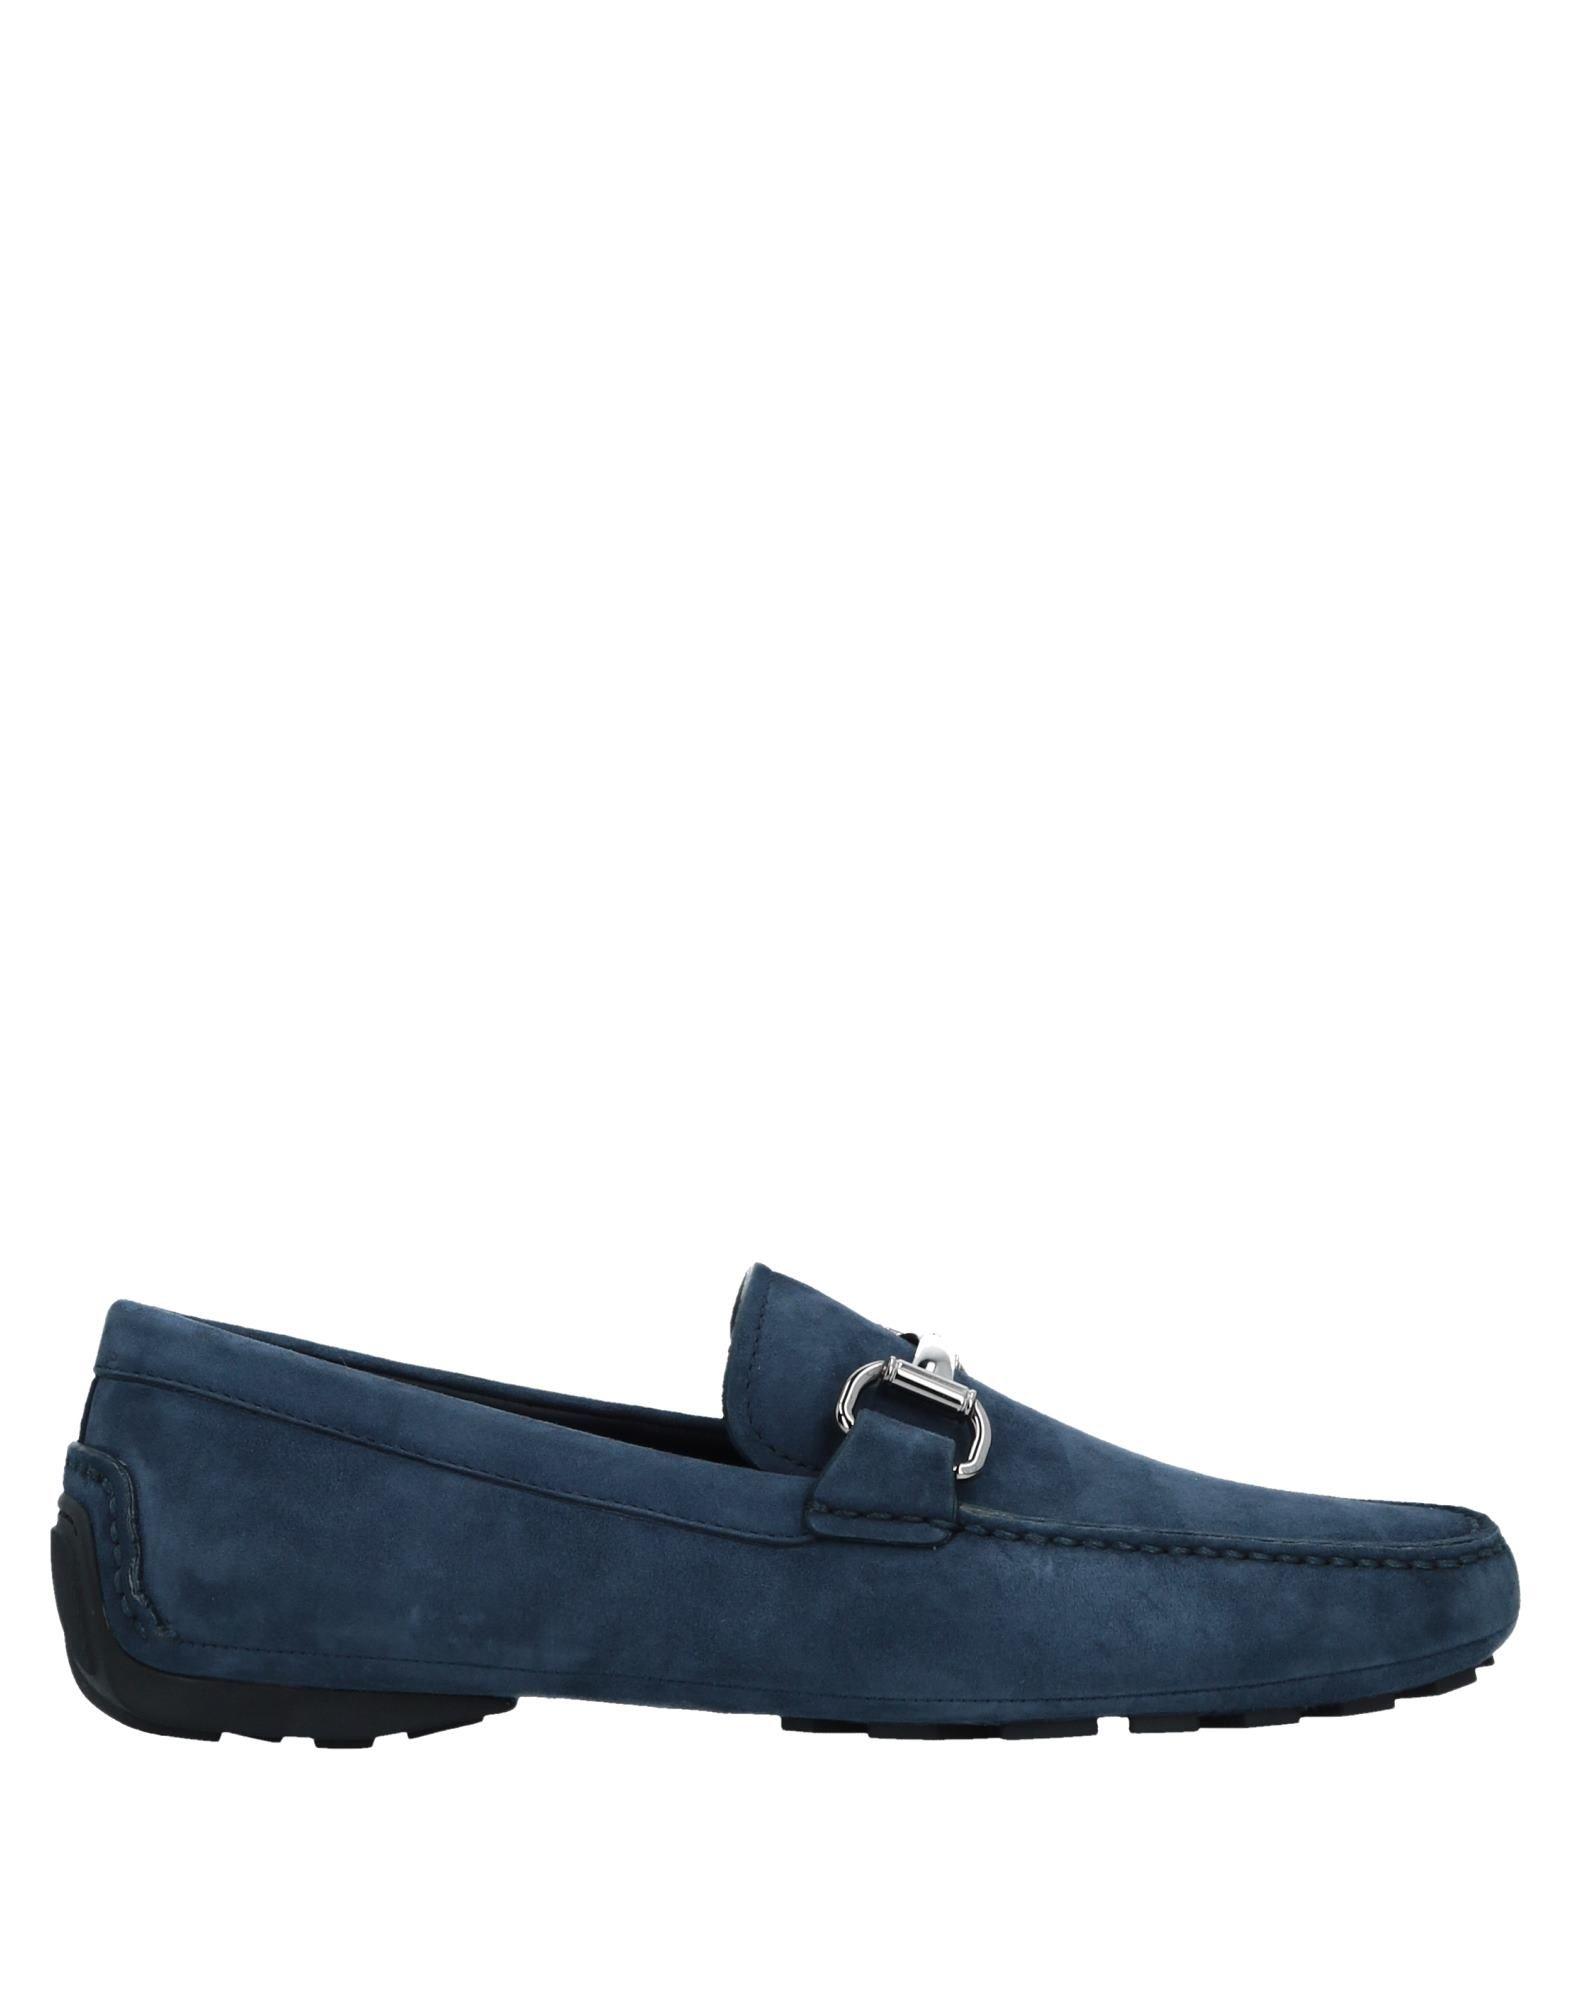 Ermenegildo Zegna Mokassins Herren  11518850JJ Gute Qualität beliebte Schuhe